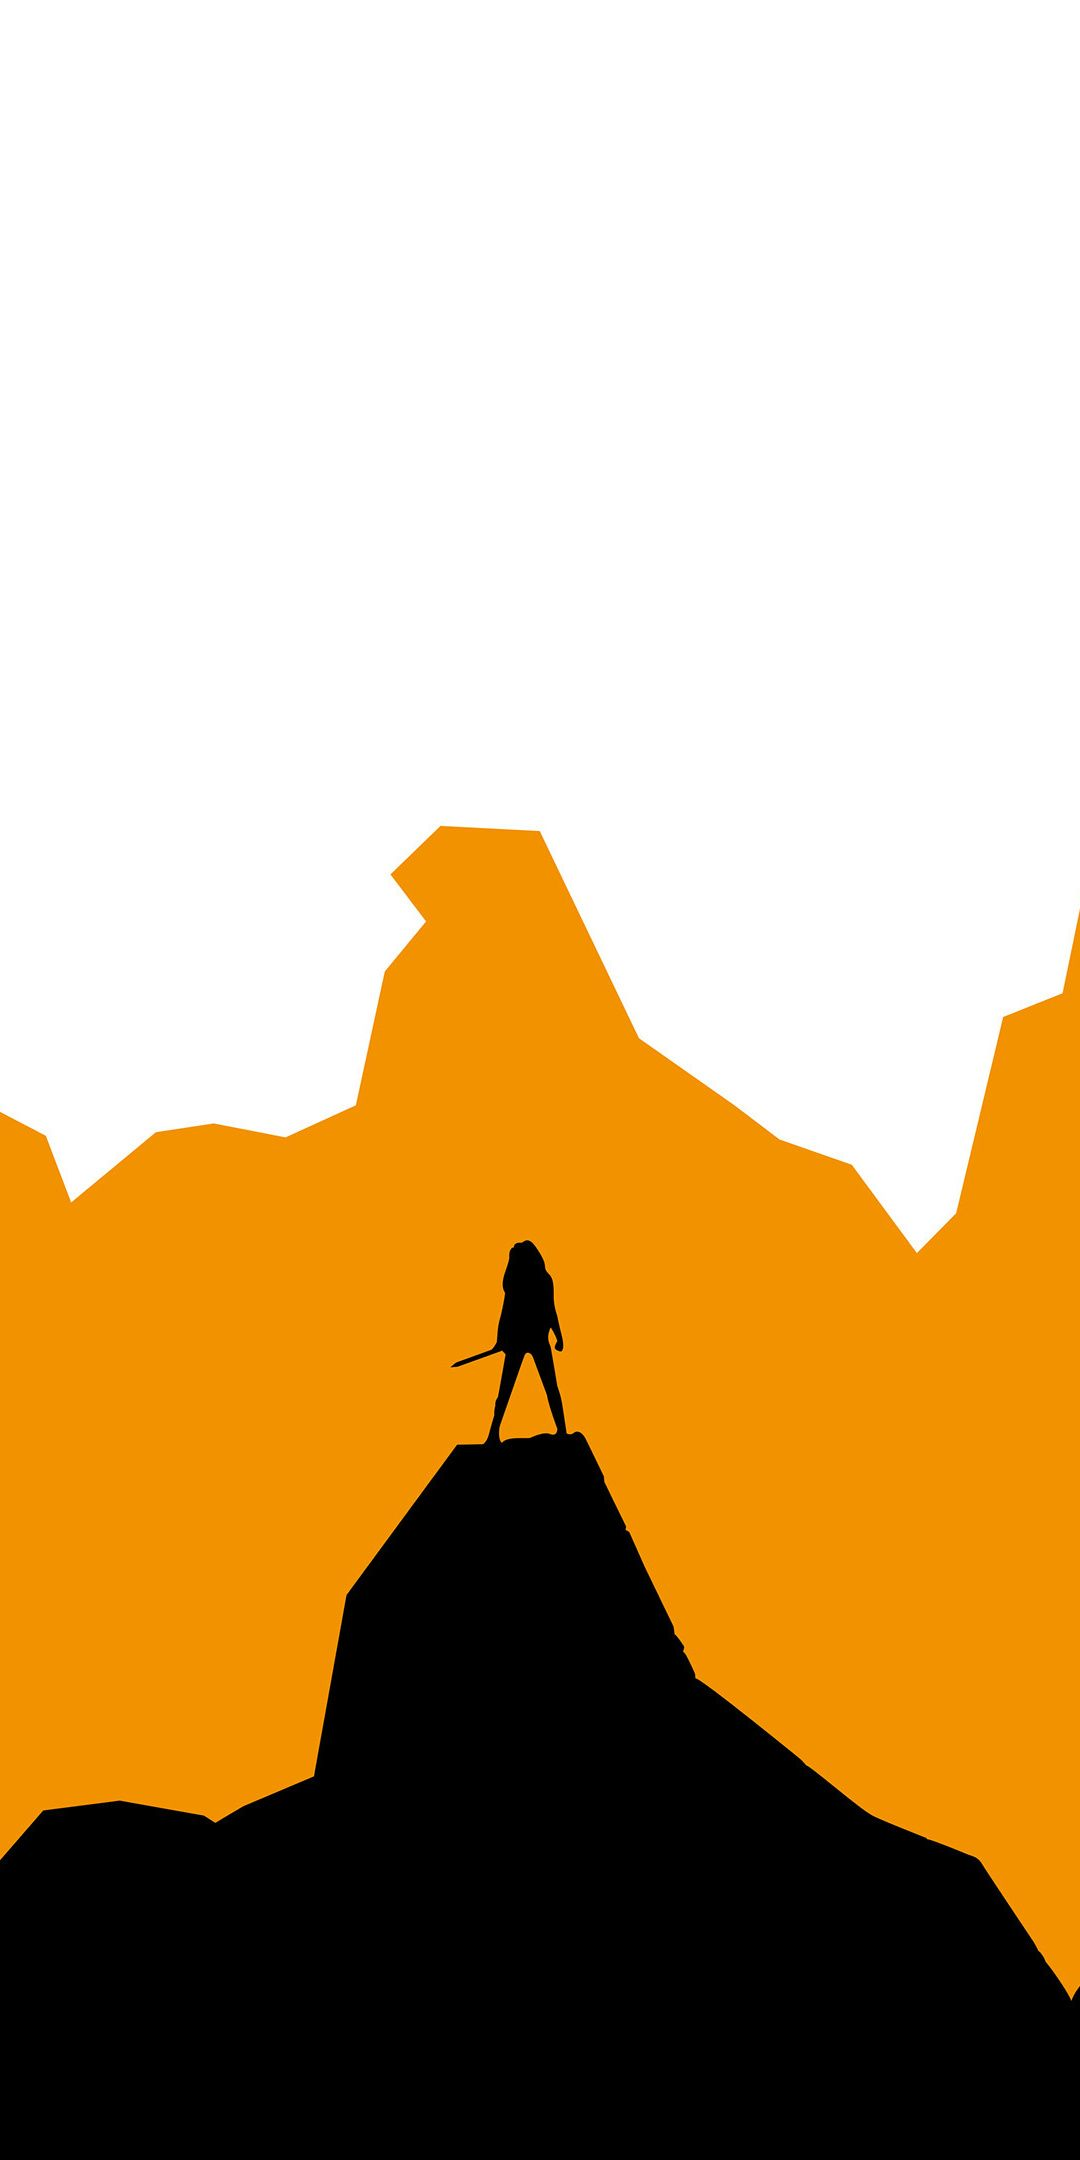 Wonder Woman 1984 Silhouette Minimal Art 1080x2160 Wallpaper Superhero Wallpaper Minimal Wallpaper Art